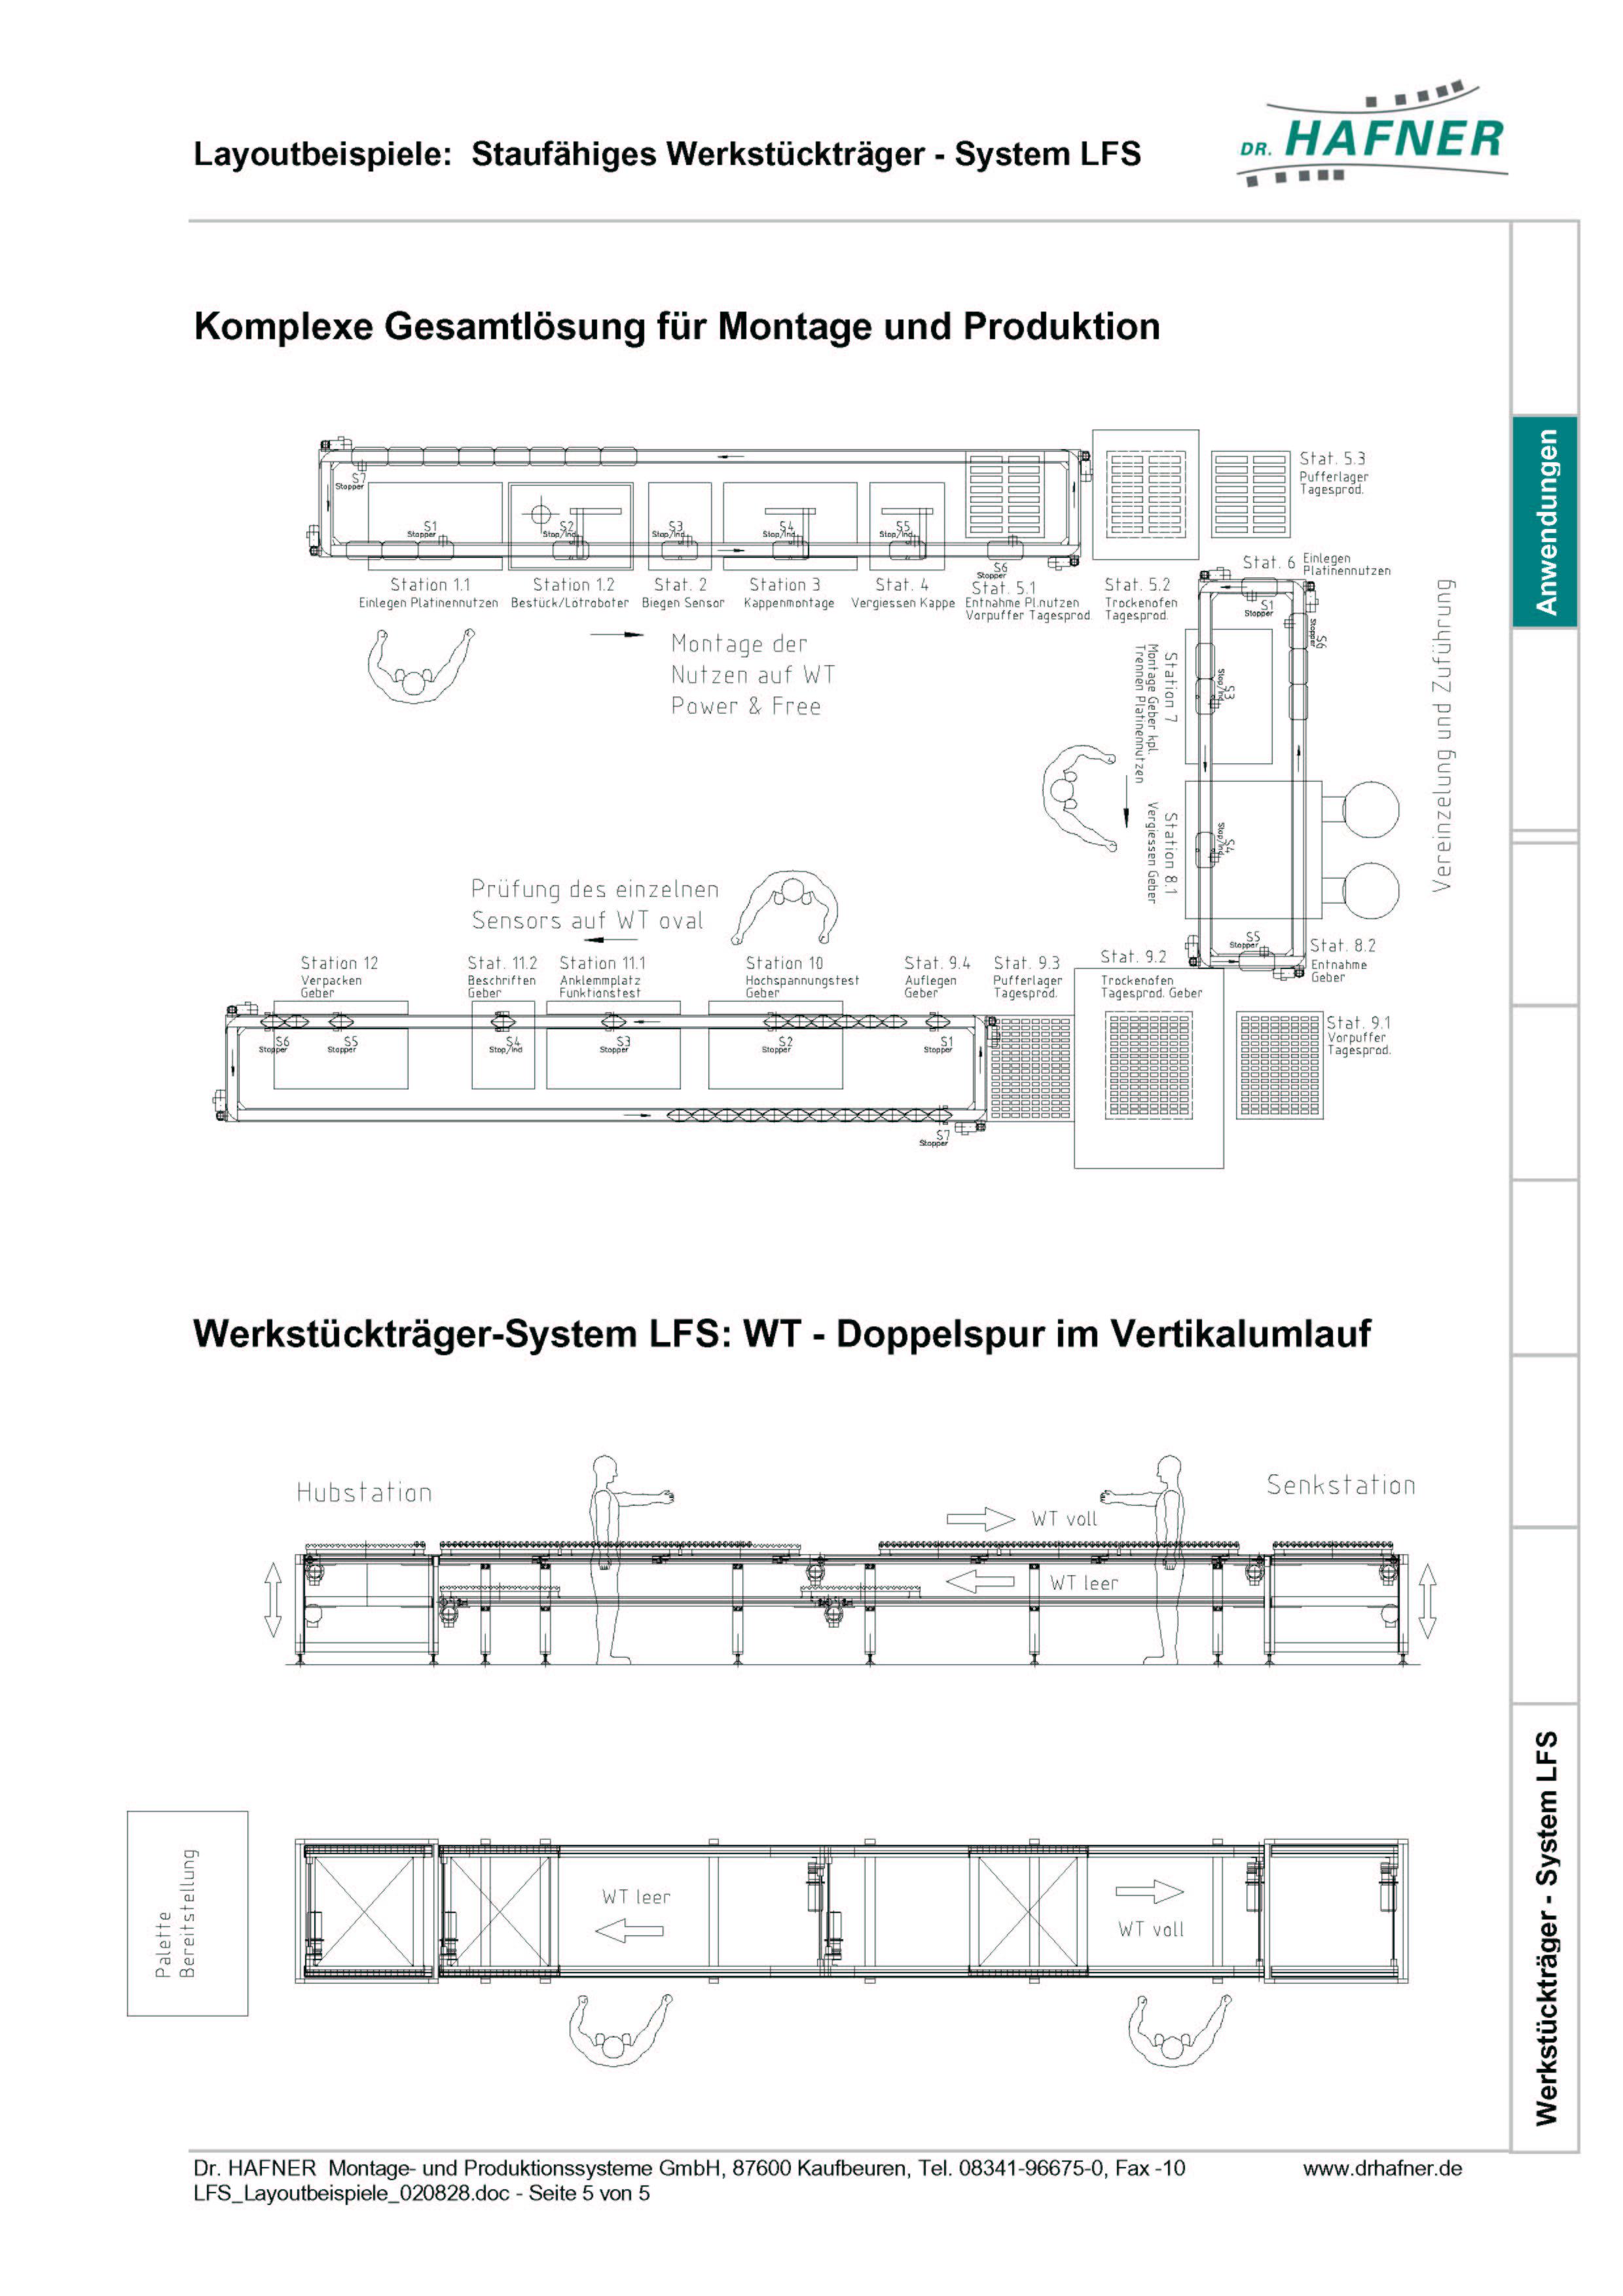 Dr. HAFNER_PKWP_36 Layout Montage Produktion Werkstückträger